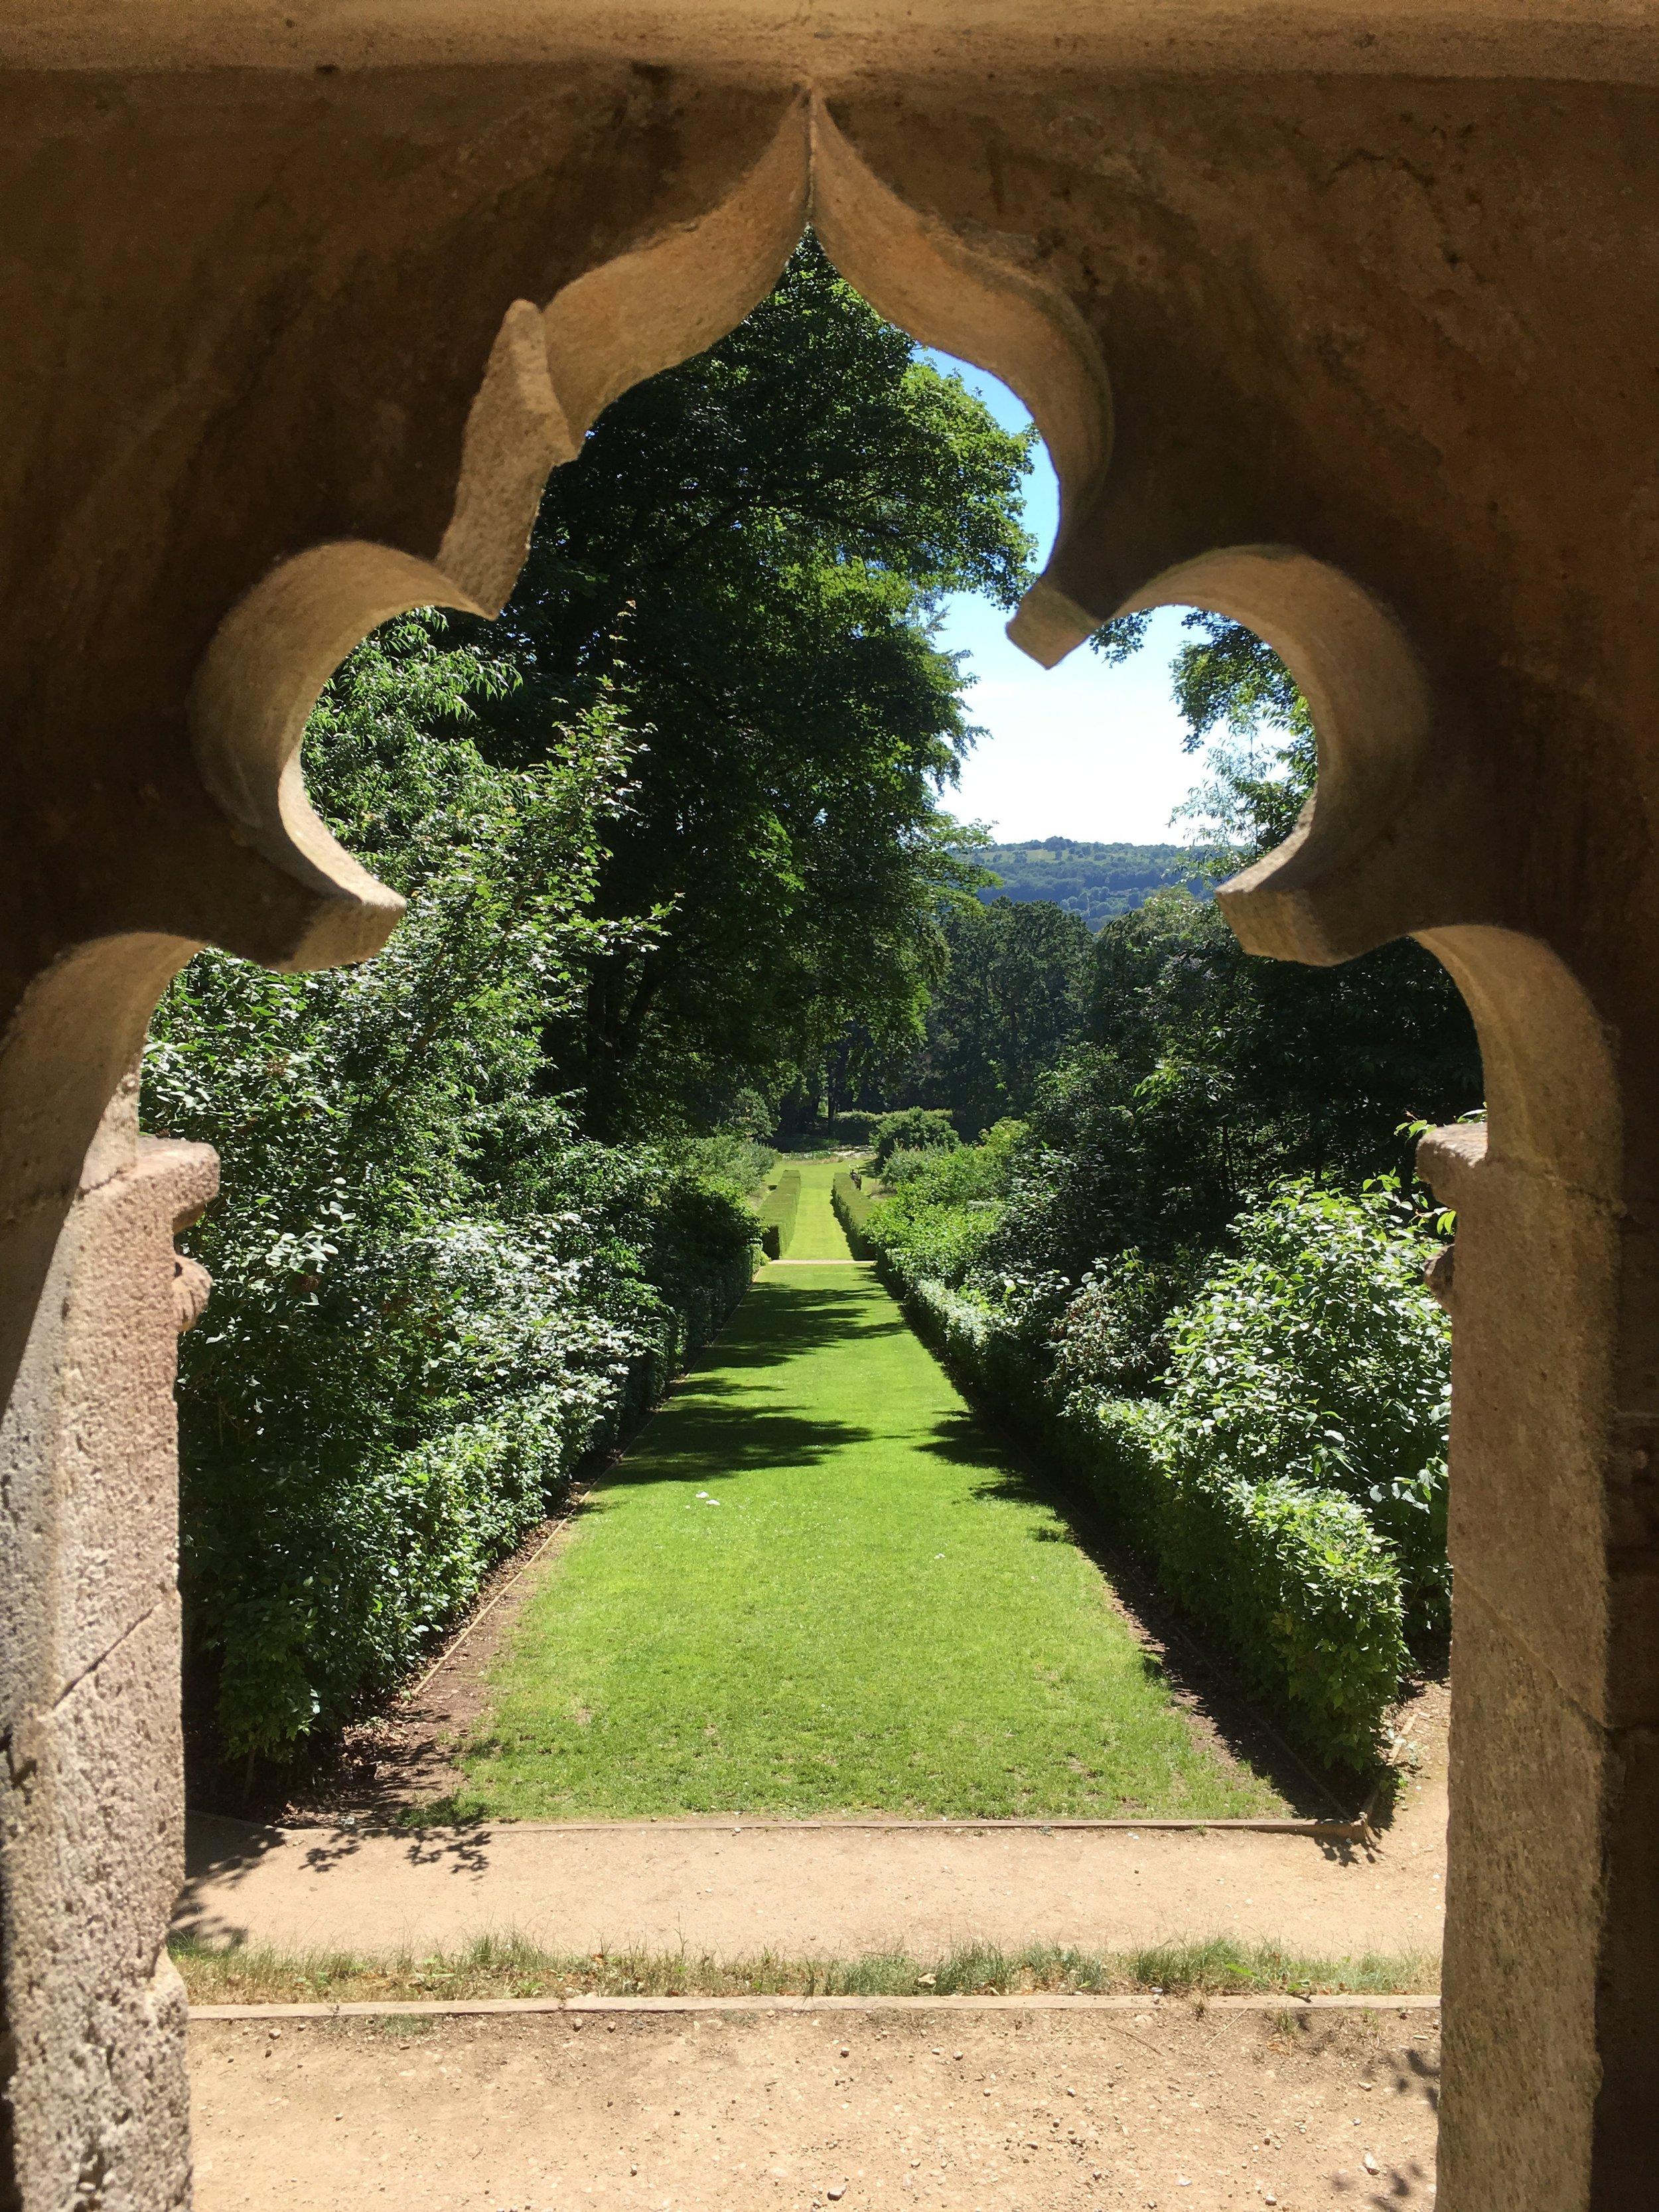 ART UNBOUND 2019 - Rococo GardensPainswick,Gloucestershire GL6 6TH19 May/8 Sepwww.rococogarden.org.uk/Art-Unbound